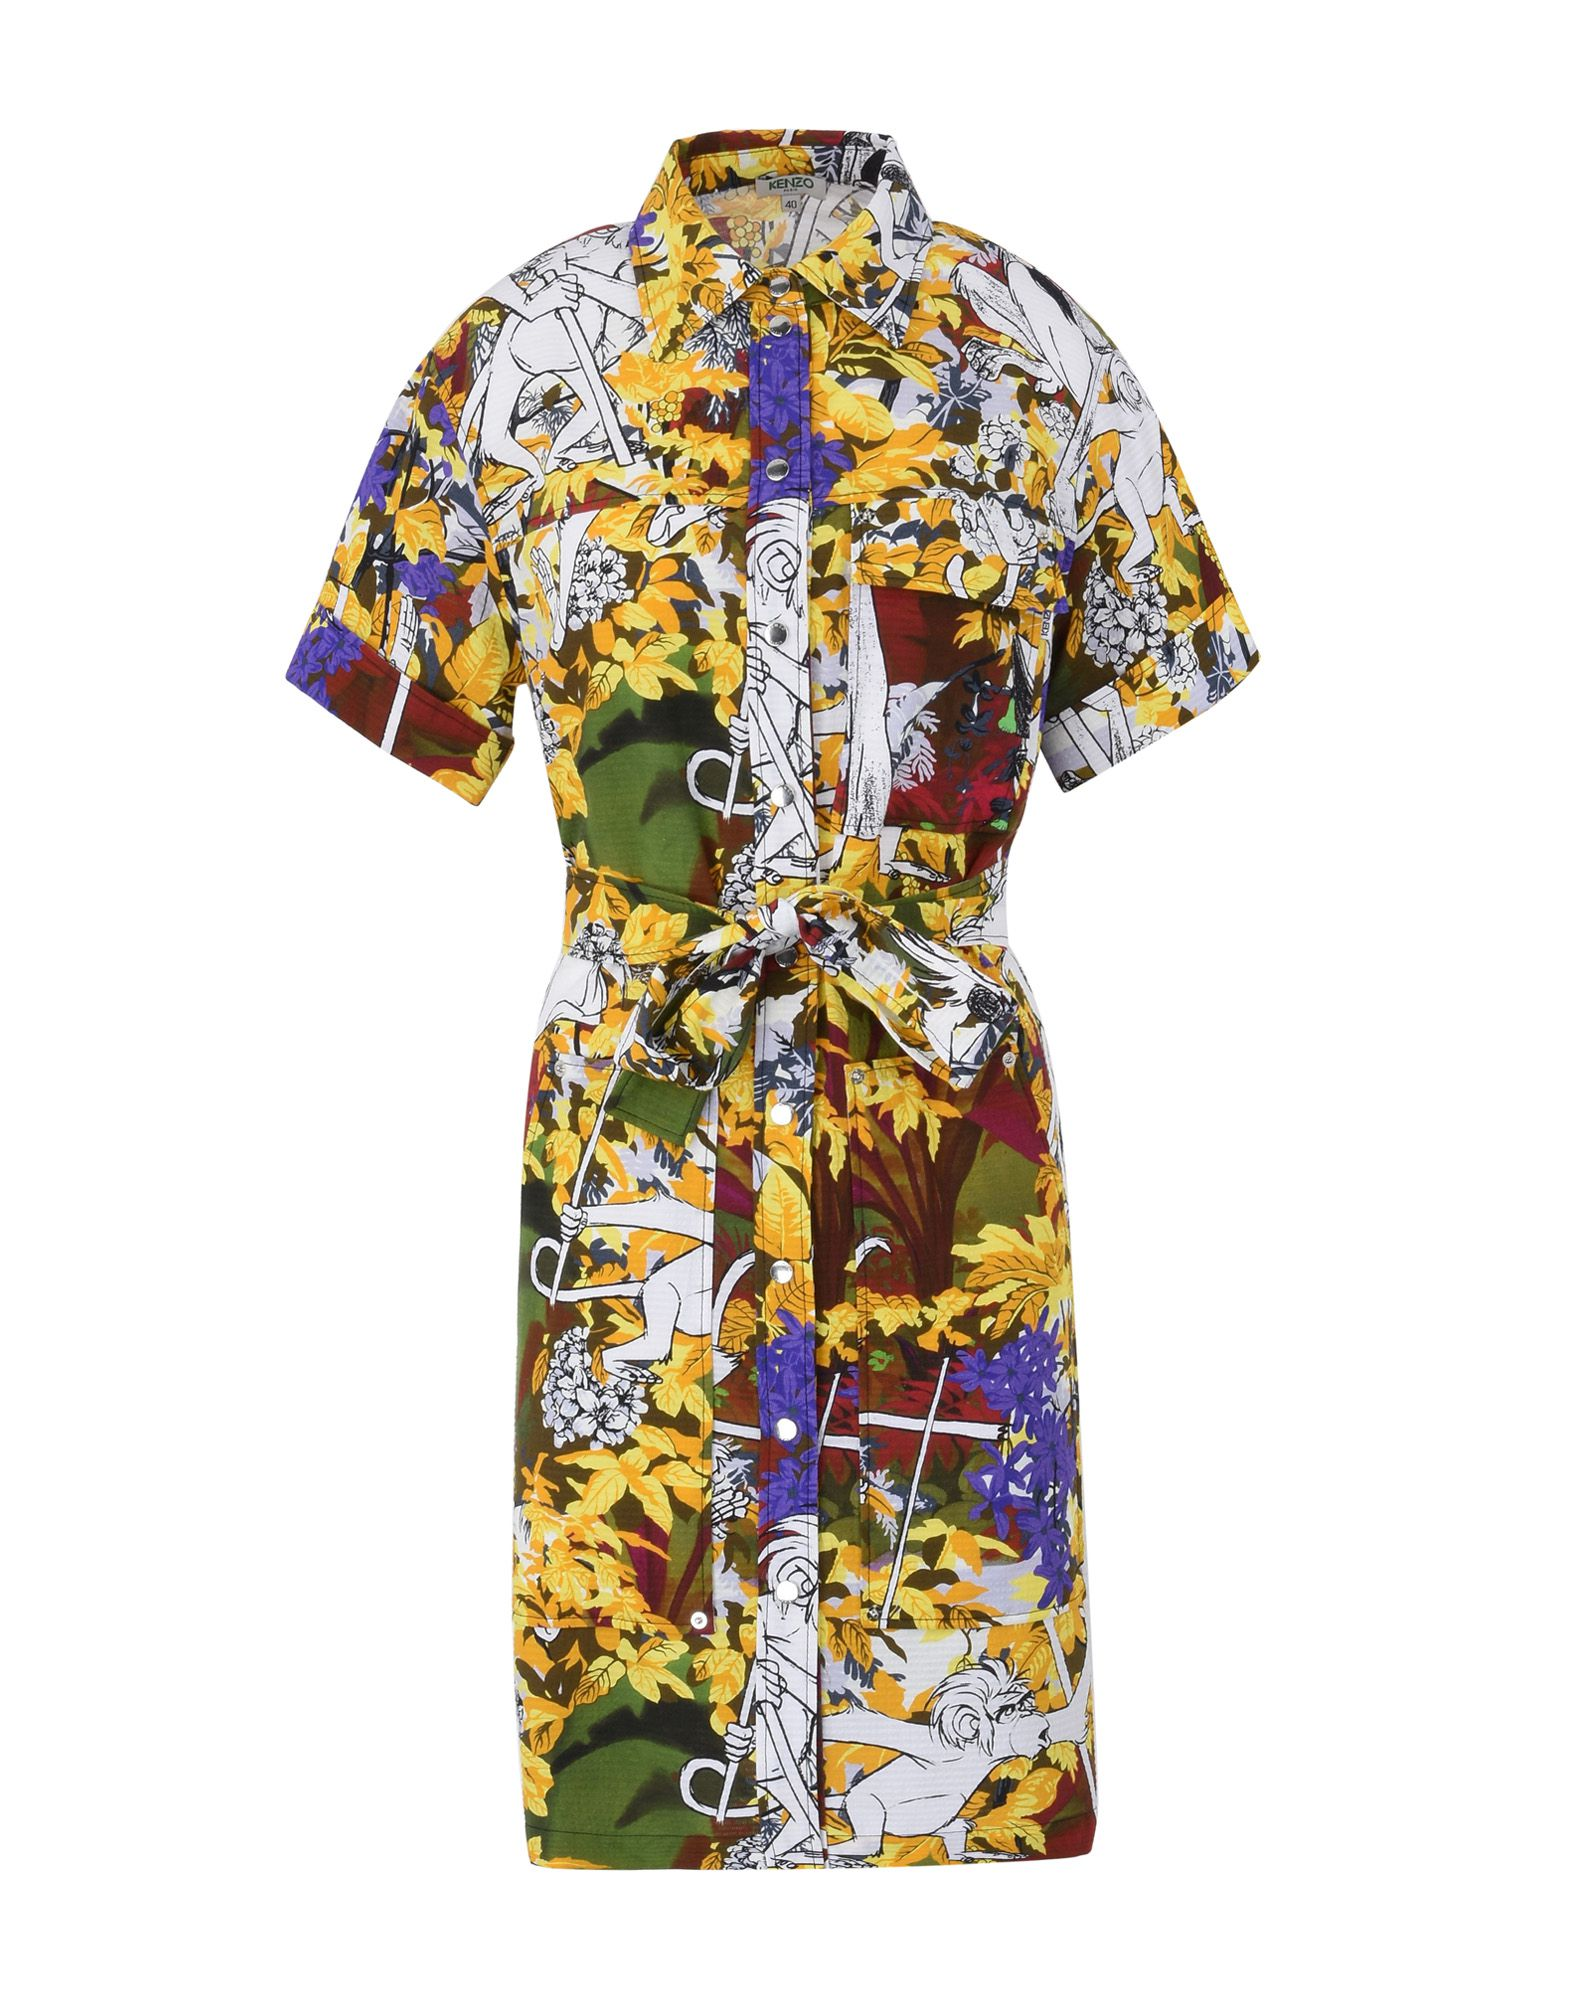 kenzo x disney robe special pe16 shirt dress women kenzo x